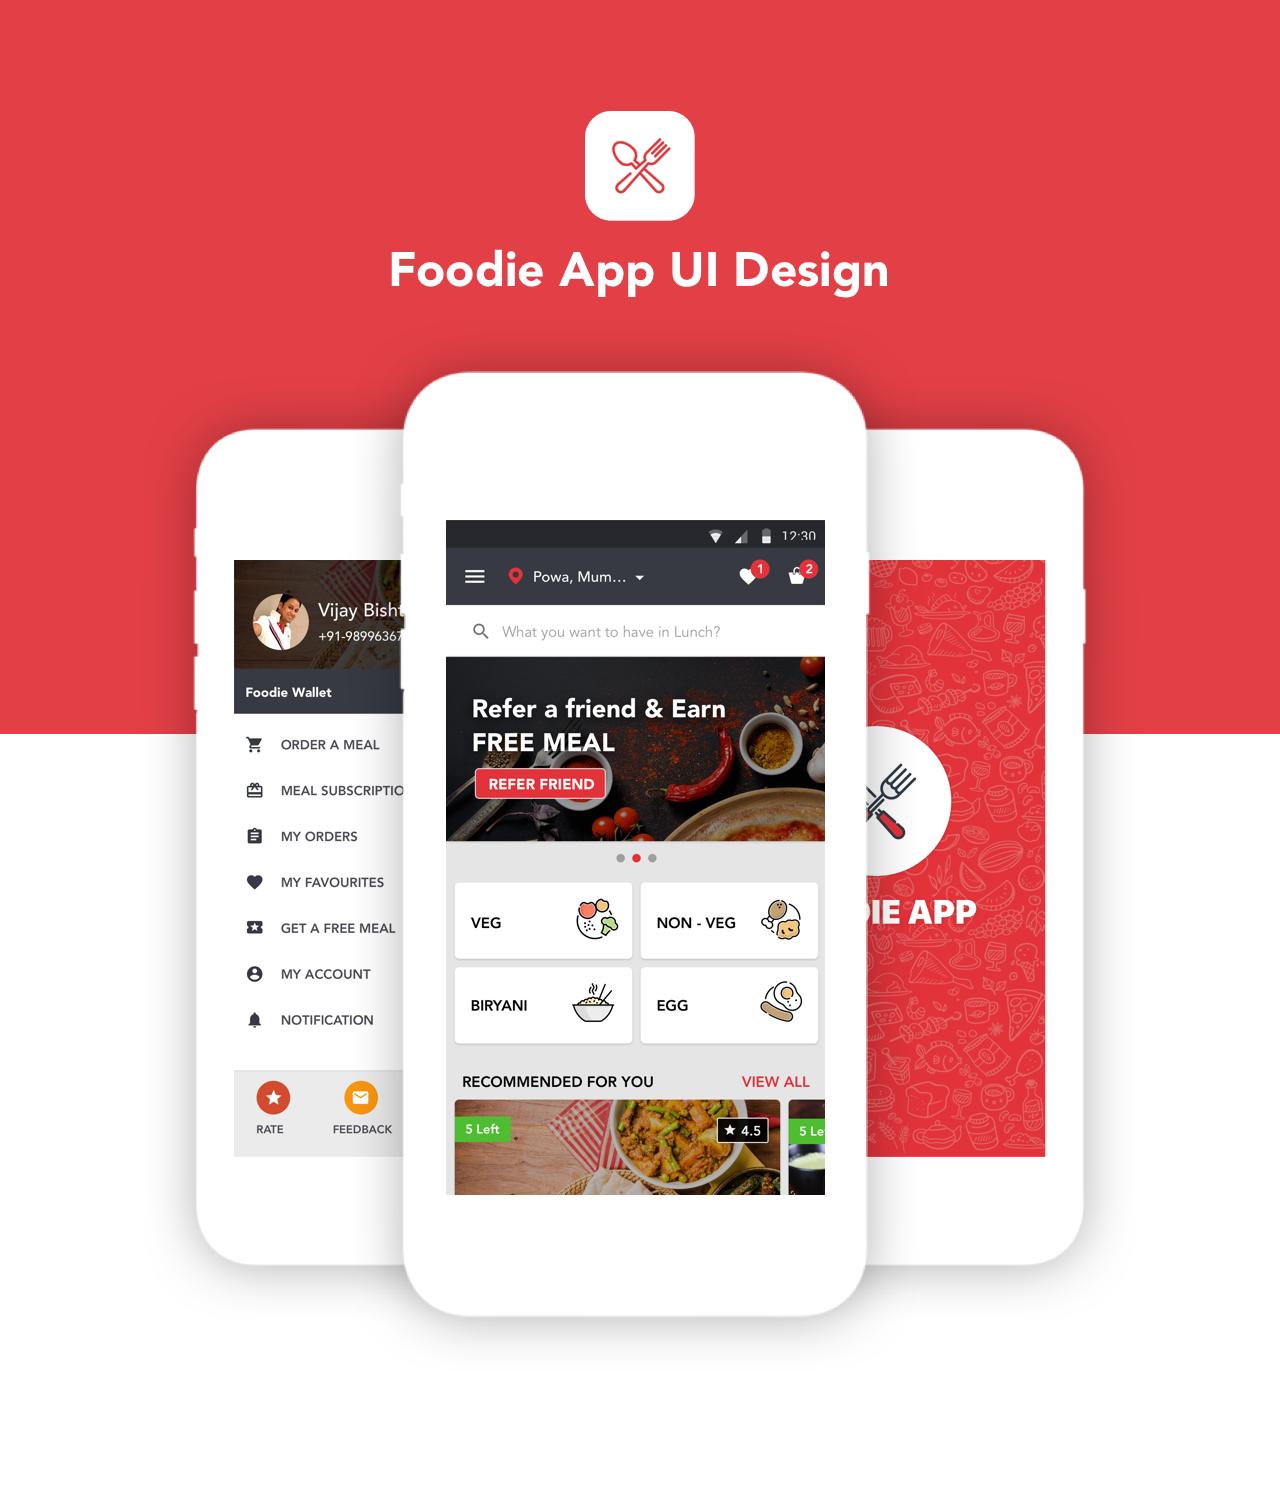 Web Design Complete Your Profile